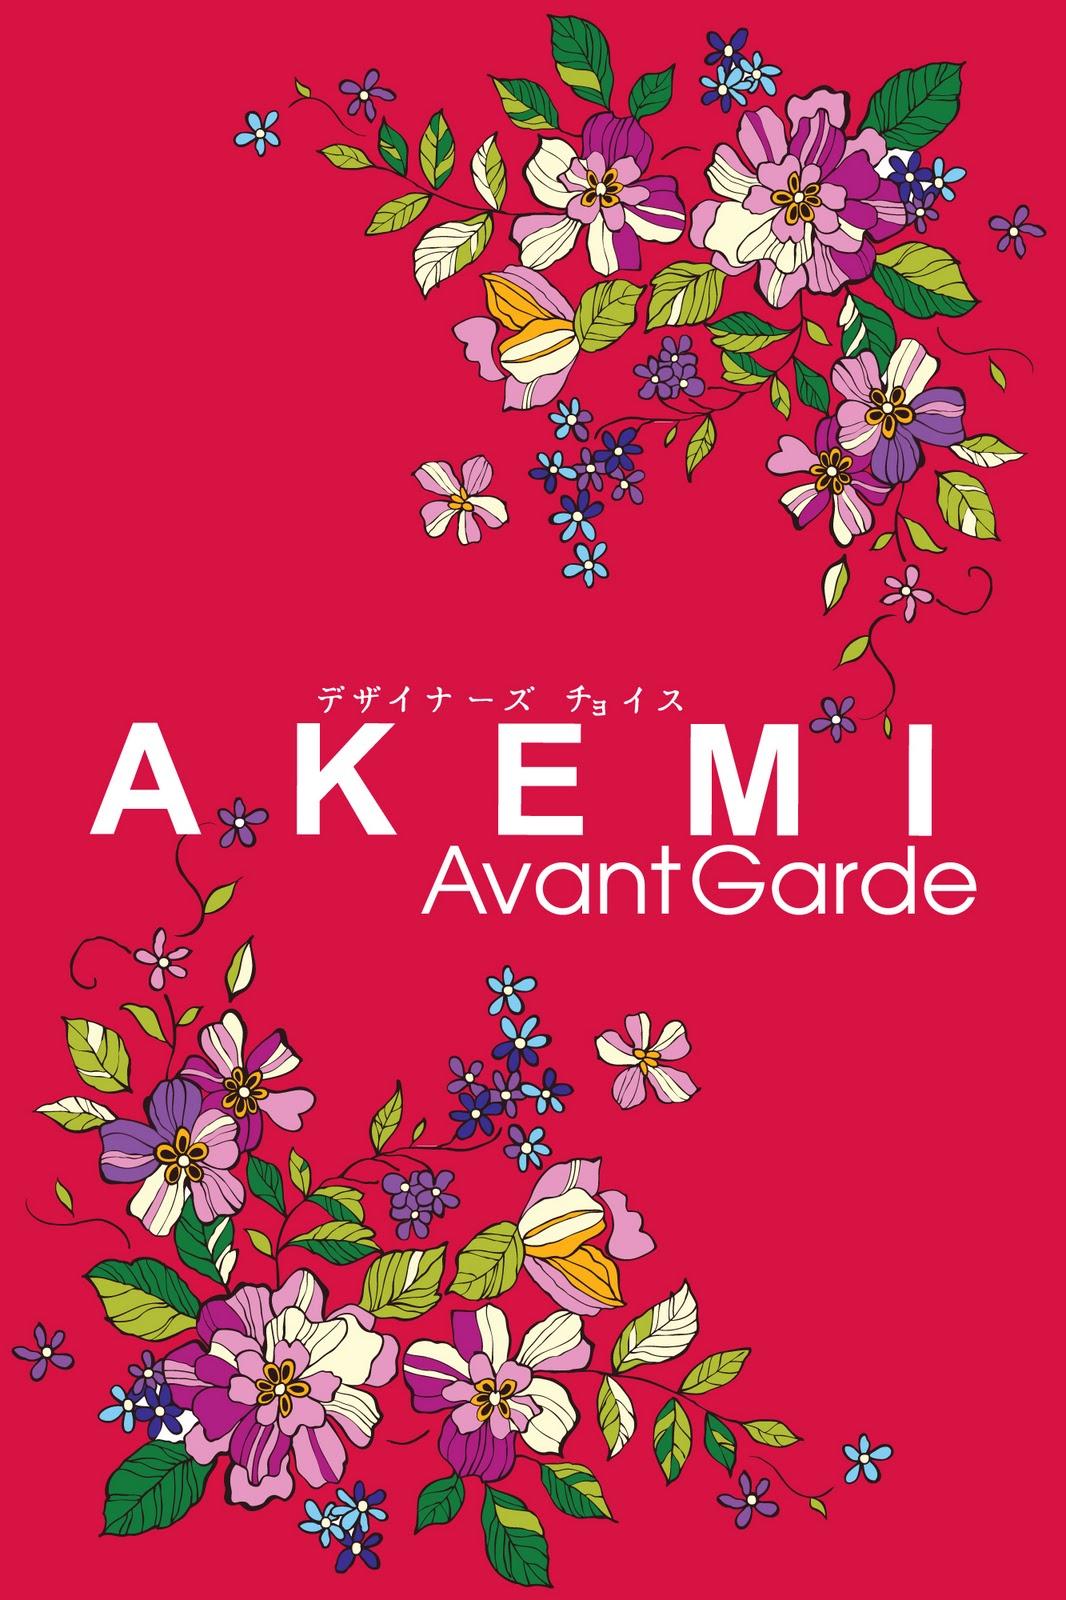 http://1.bp.blogspot.com/_sGOwci2MVpw/TSbjRBLQcEI/AAAAAAAAAXs/YwODrIaGVpk/s1600/Akemi+Avantgarde+CNY+Iphone.jpg